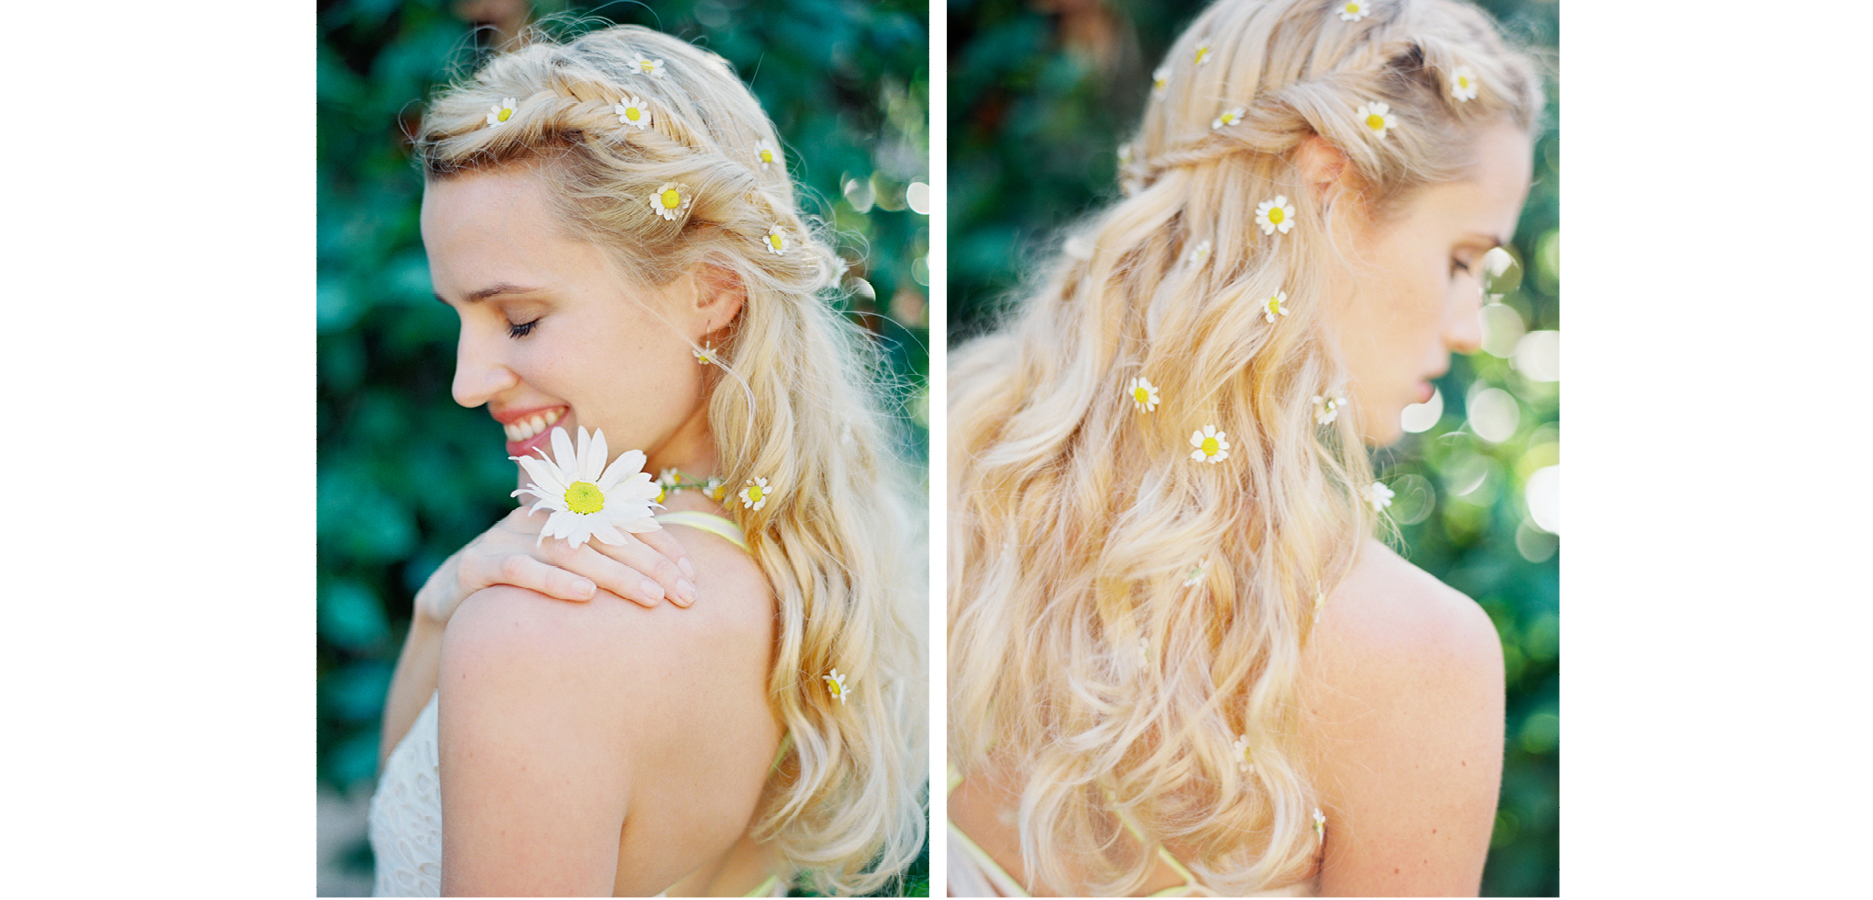 Jess-Wilcox-Hair-Makeup-Wedding_portfolio12.jpg